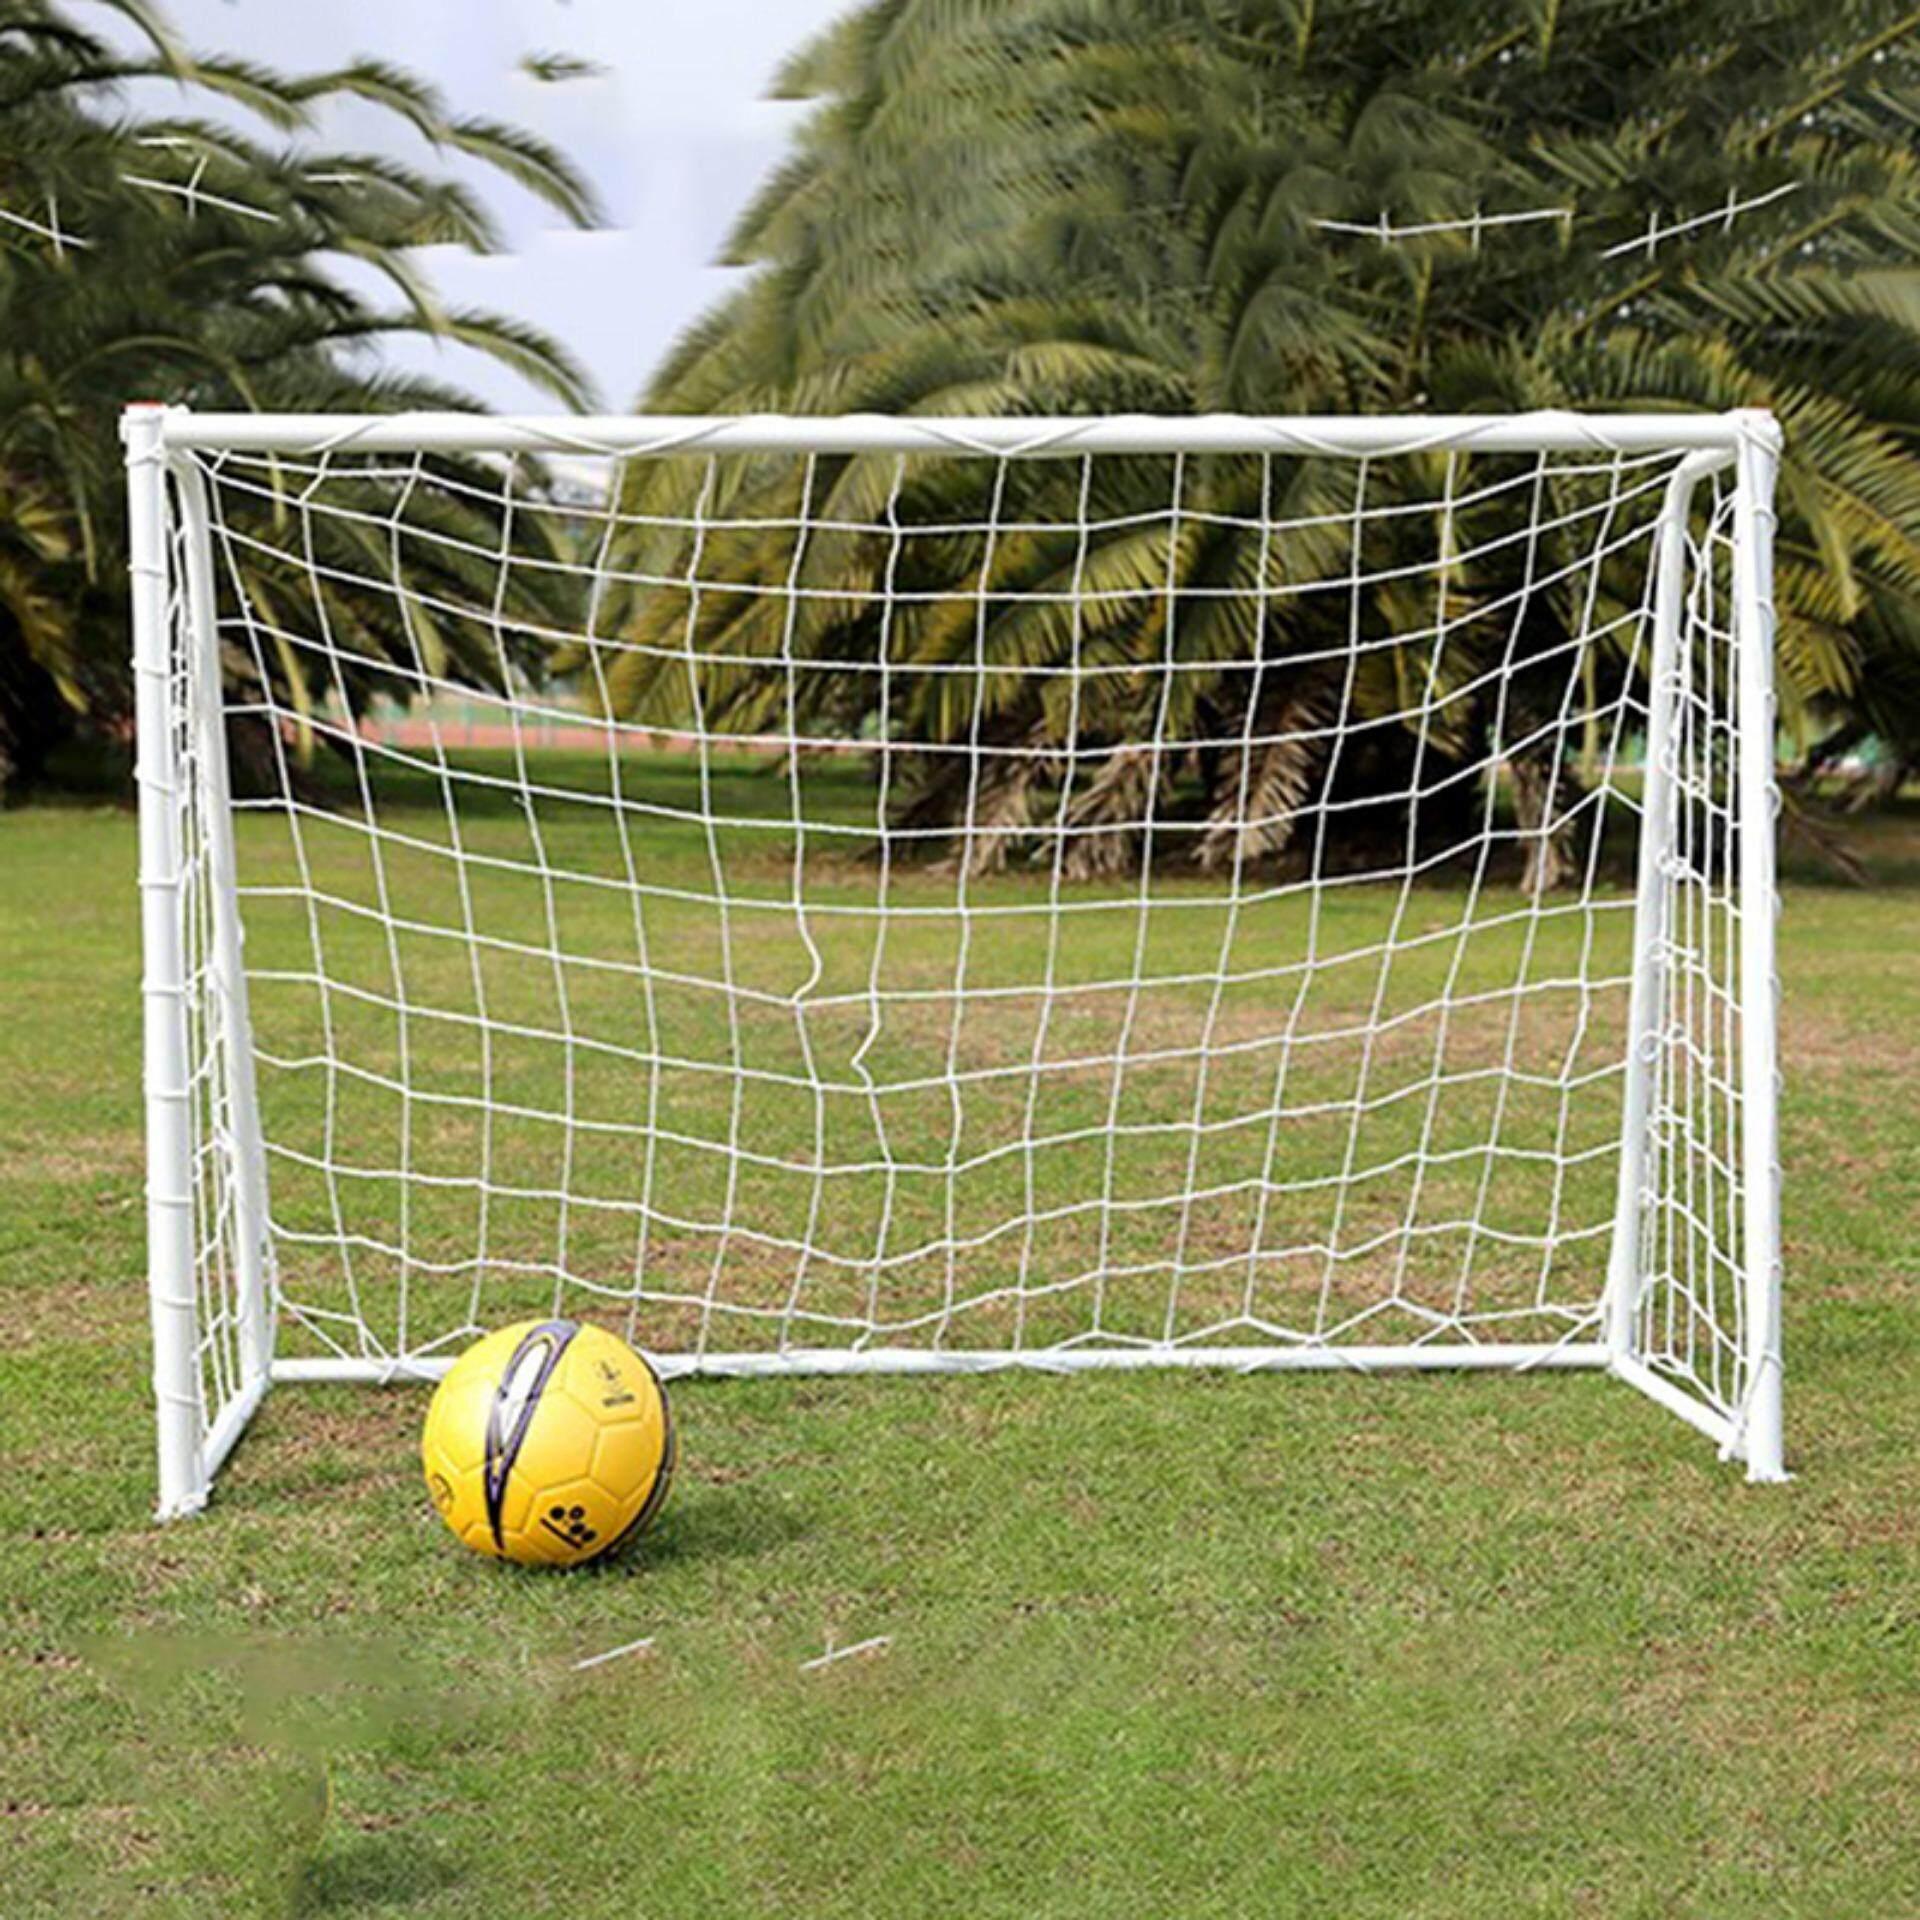 6 X 4ft Football Soccer Goal Post Net For Kids Outdoor Football Match Training By Greenwind.